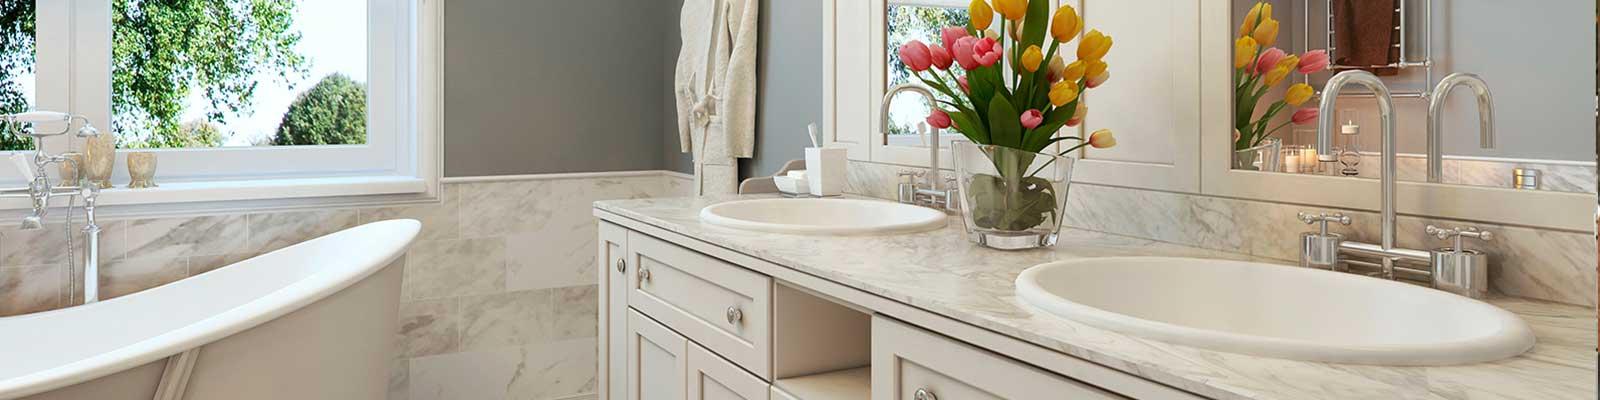 kitchen & bath backslash notre dame agencies limited